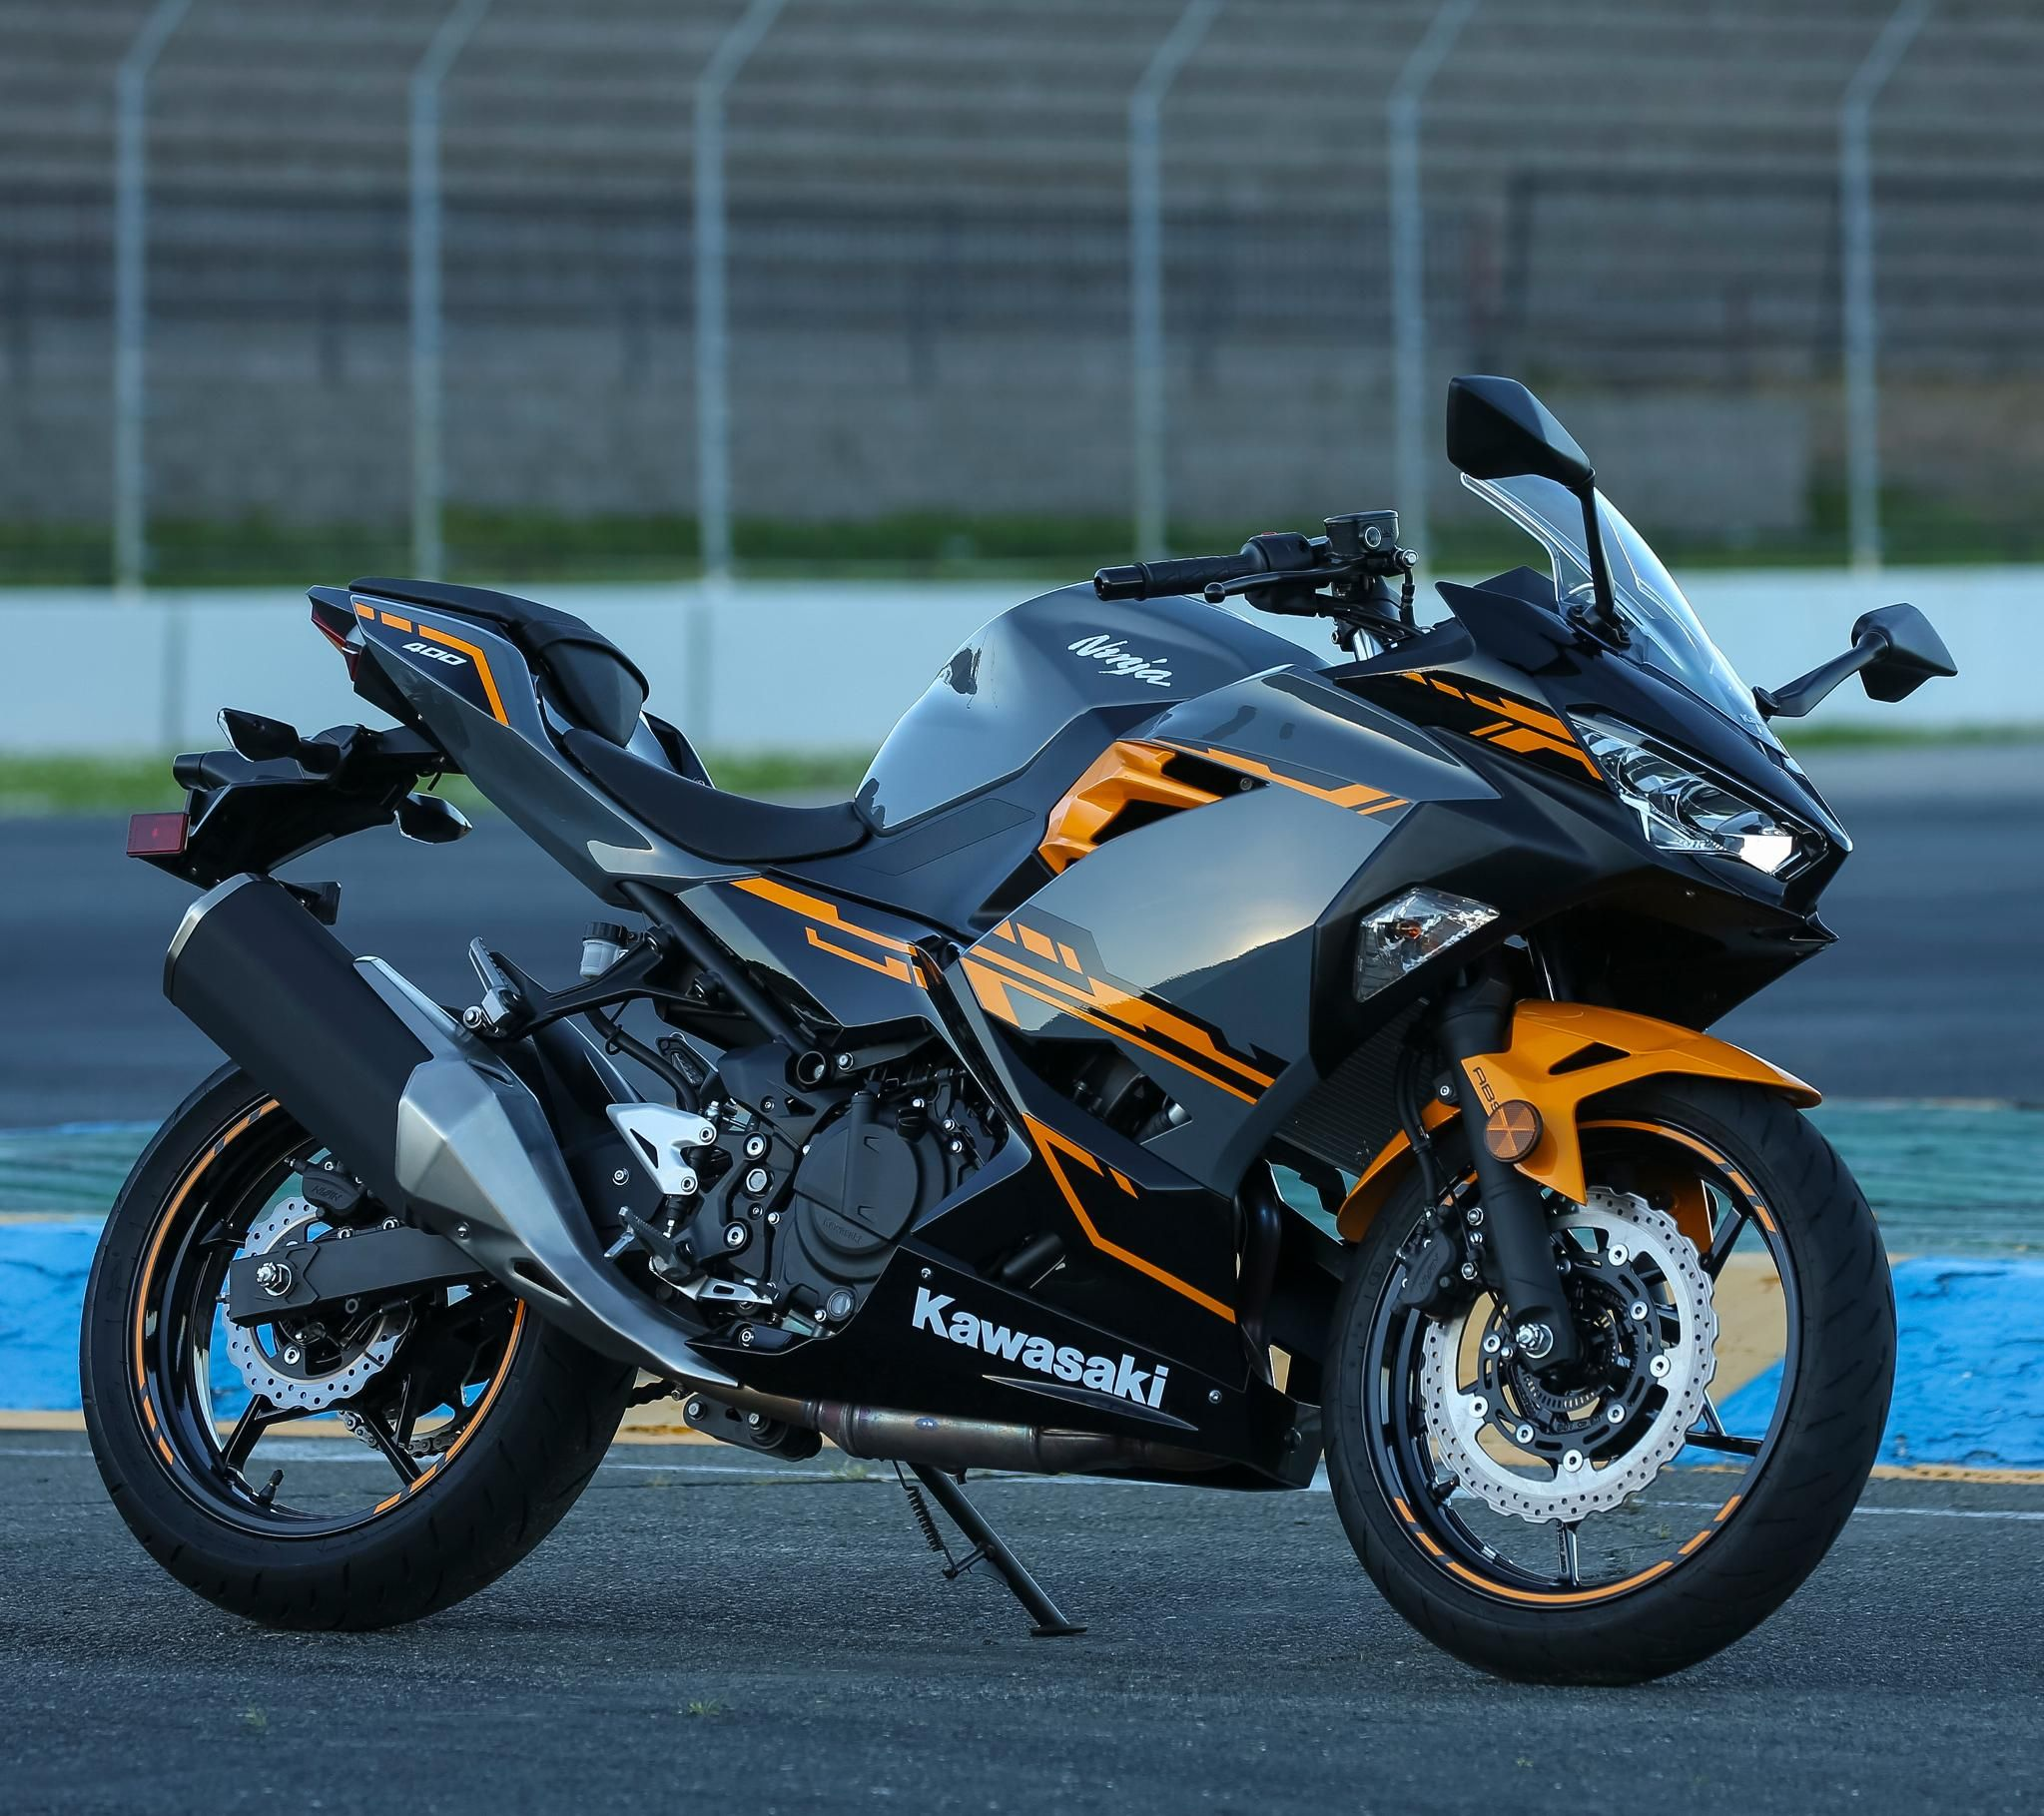 Top Speed Motor Kawasaki Ninja 300